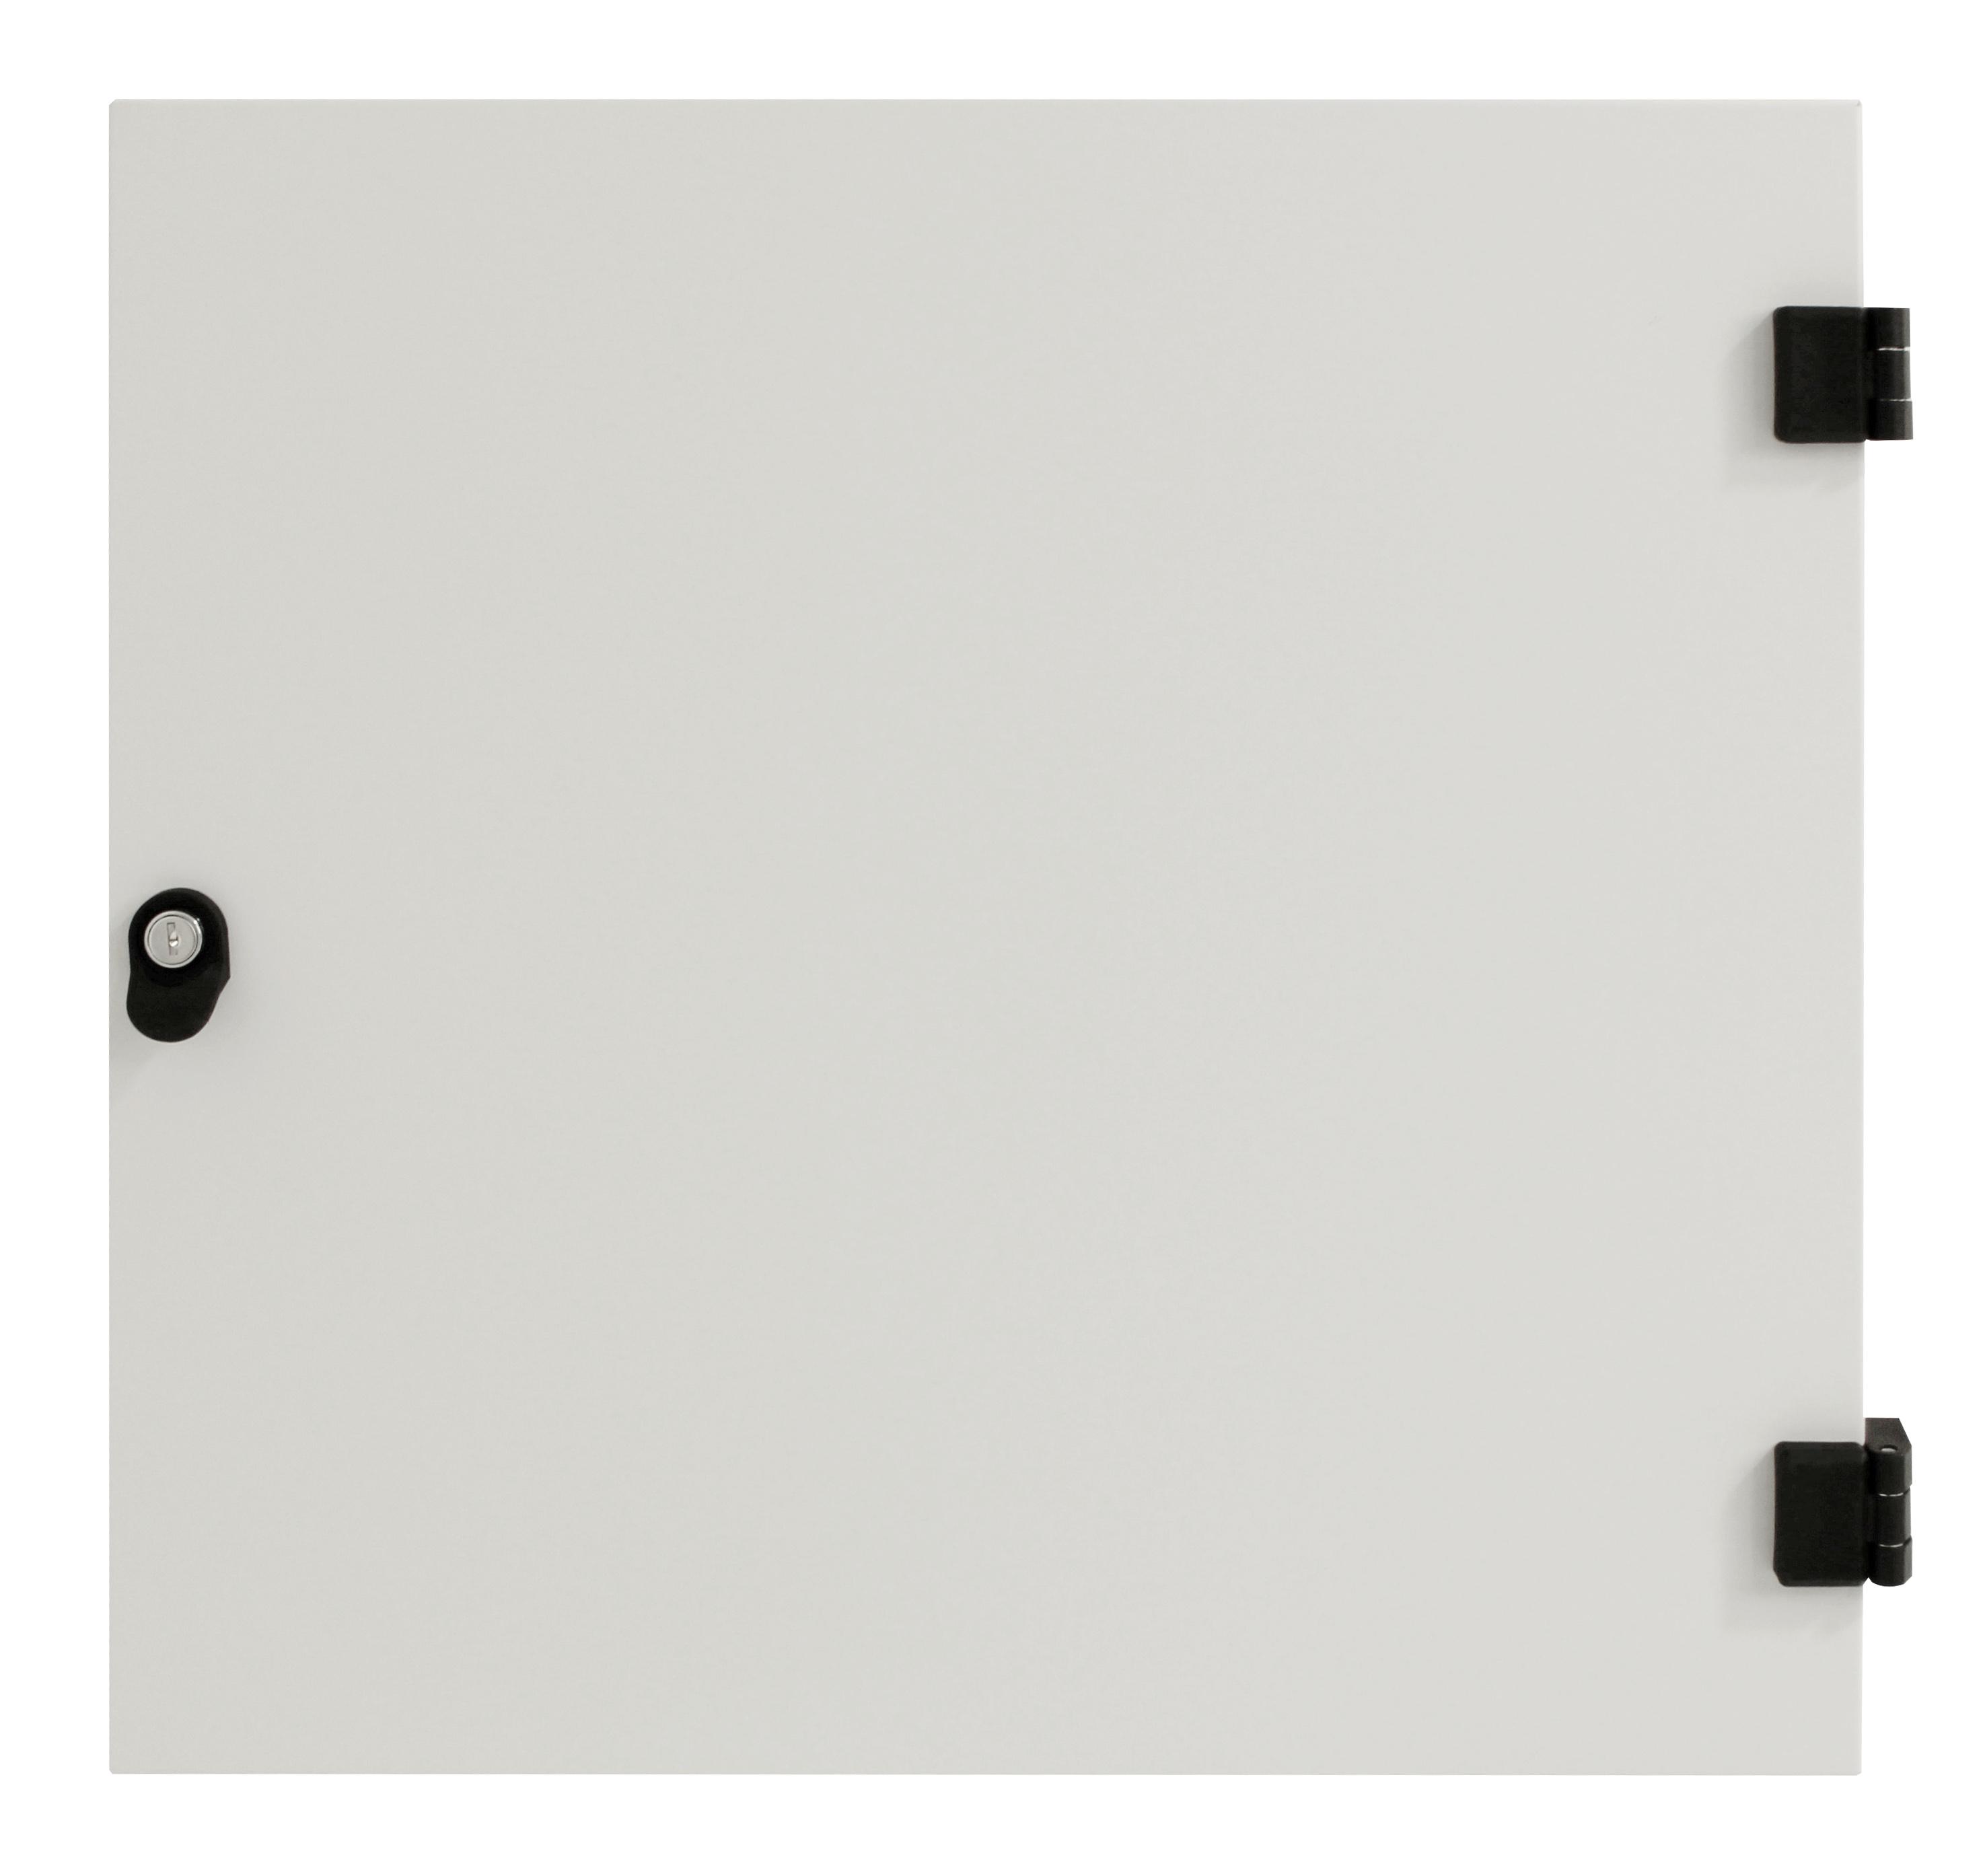 1 Stk Metall-Tür voll für DW-Schrank 18HE, B=600, RAL7035 DWRT1860--